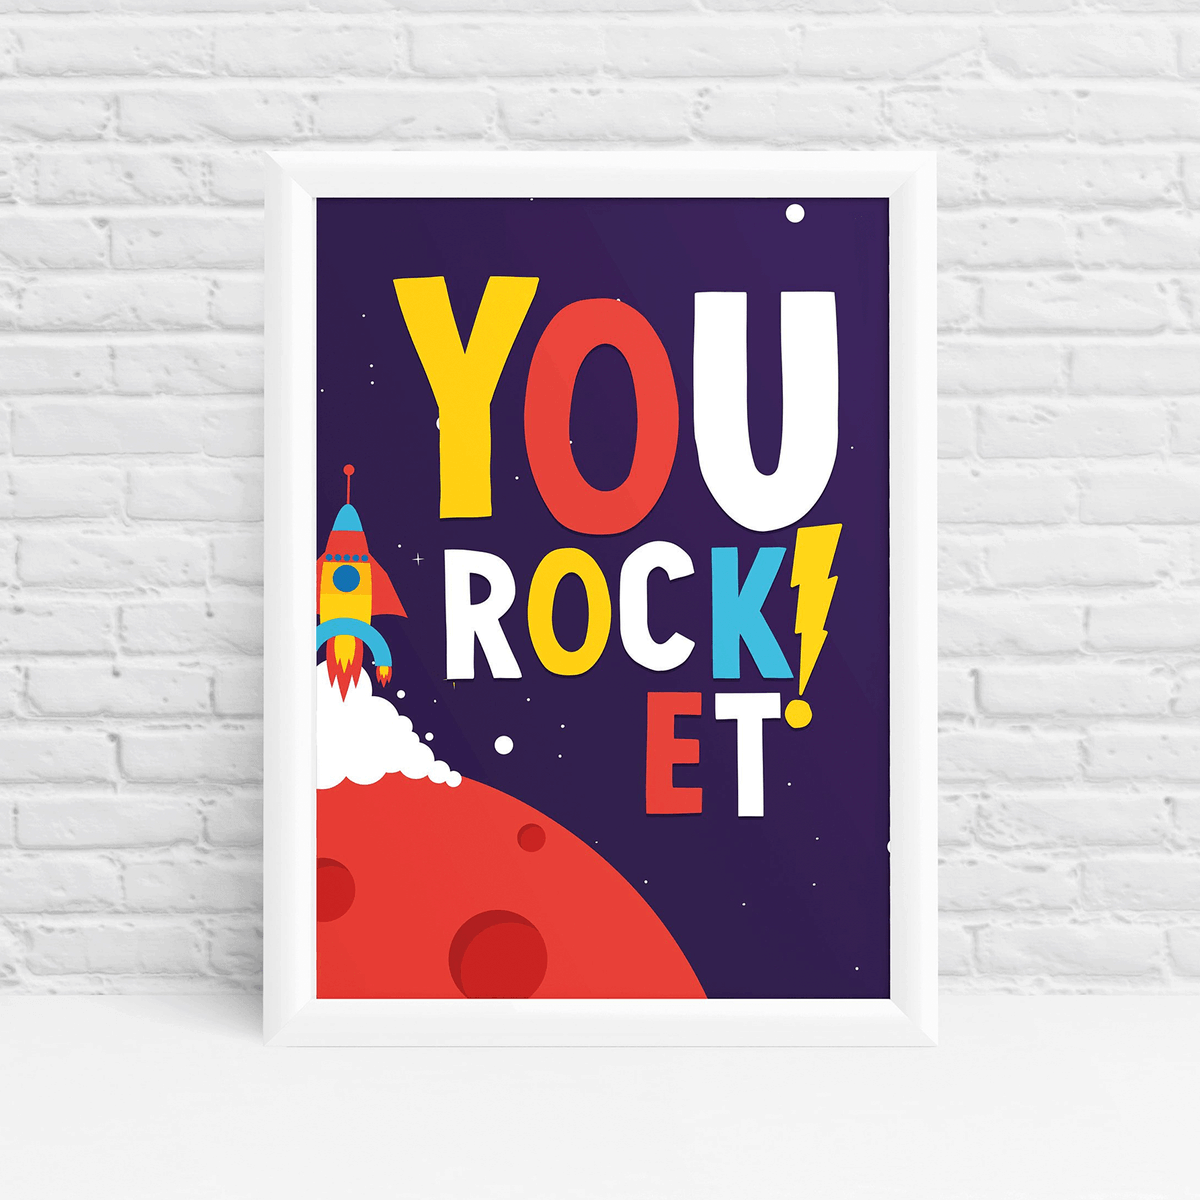 #Space is #Ace #WallArt by #Ibbleobble!   https://t.co/FX9KRbvZwV  #Spaceship #Prints #Nursery #Decor #Decoration #Art #Children #Astronauts #NASA #Rocket #SpaceMan #Kids #Bedroom #WallArt #OfficeSpace #Fun #Cool #ShopSmallUK #WednesdayThoughts #WednesdayWisdom #Wednesday https://t.co/M4kw4scmYc